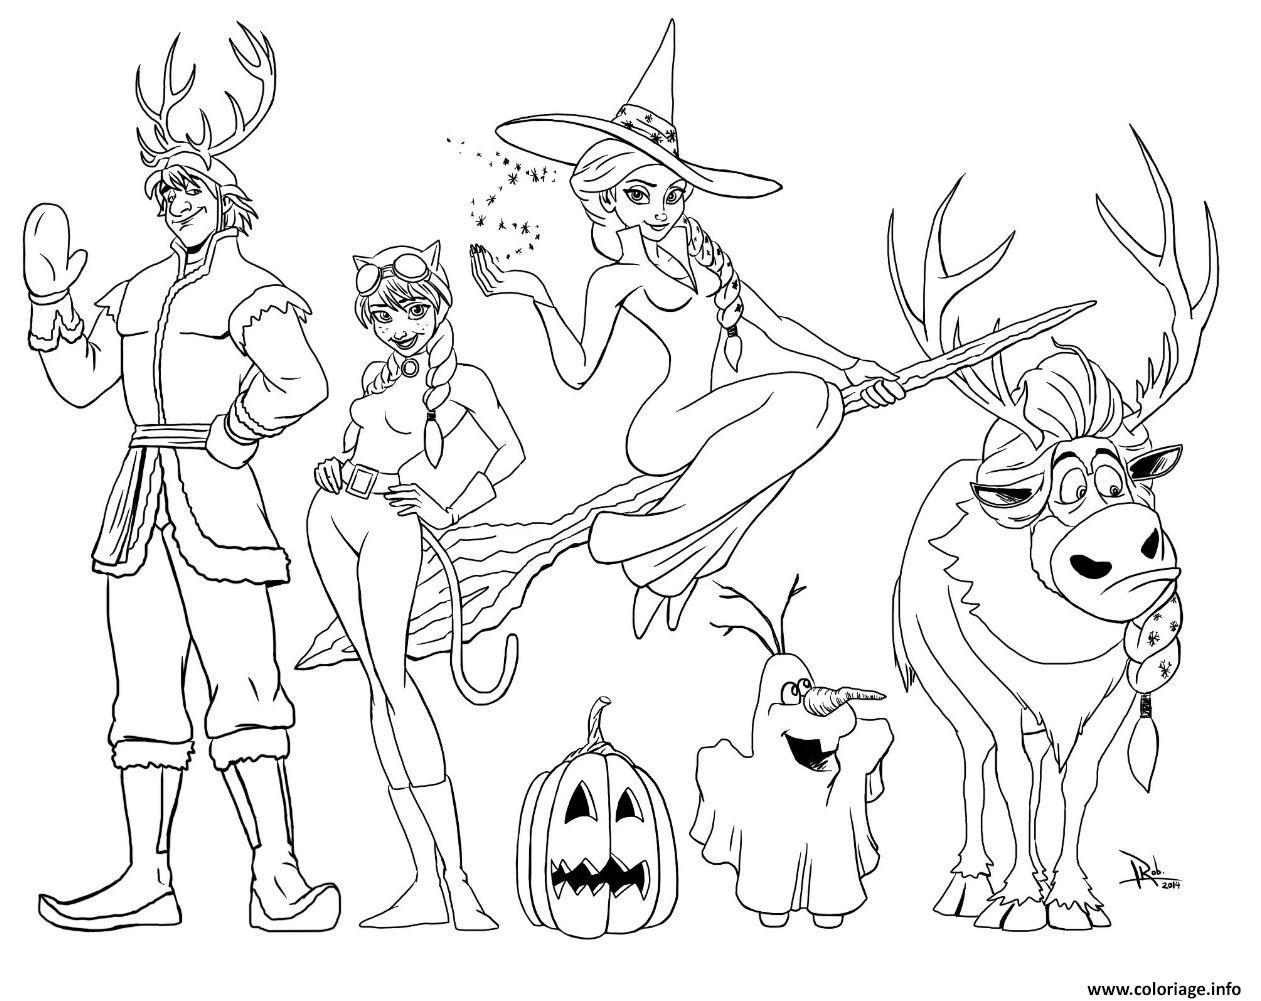 Coloriage Halloween La Reine Des Neiges Dessin  Imprimer